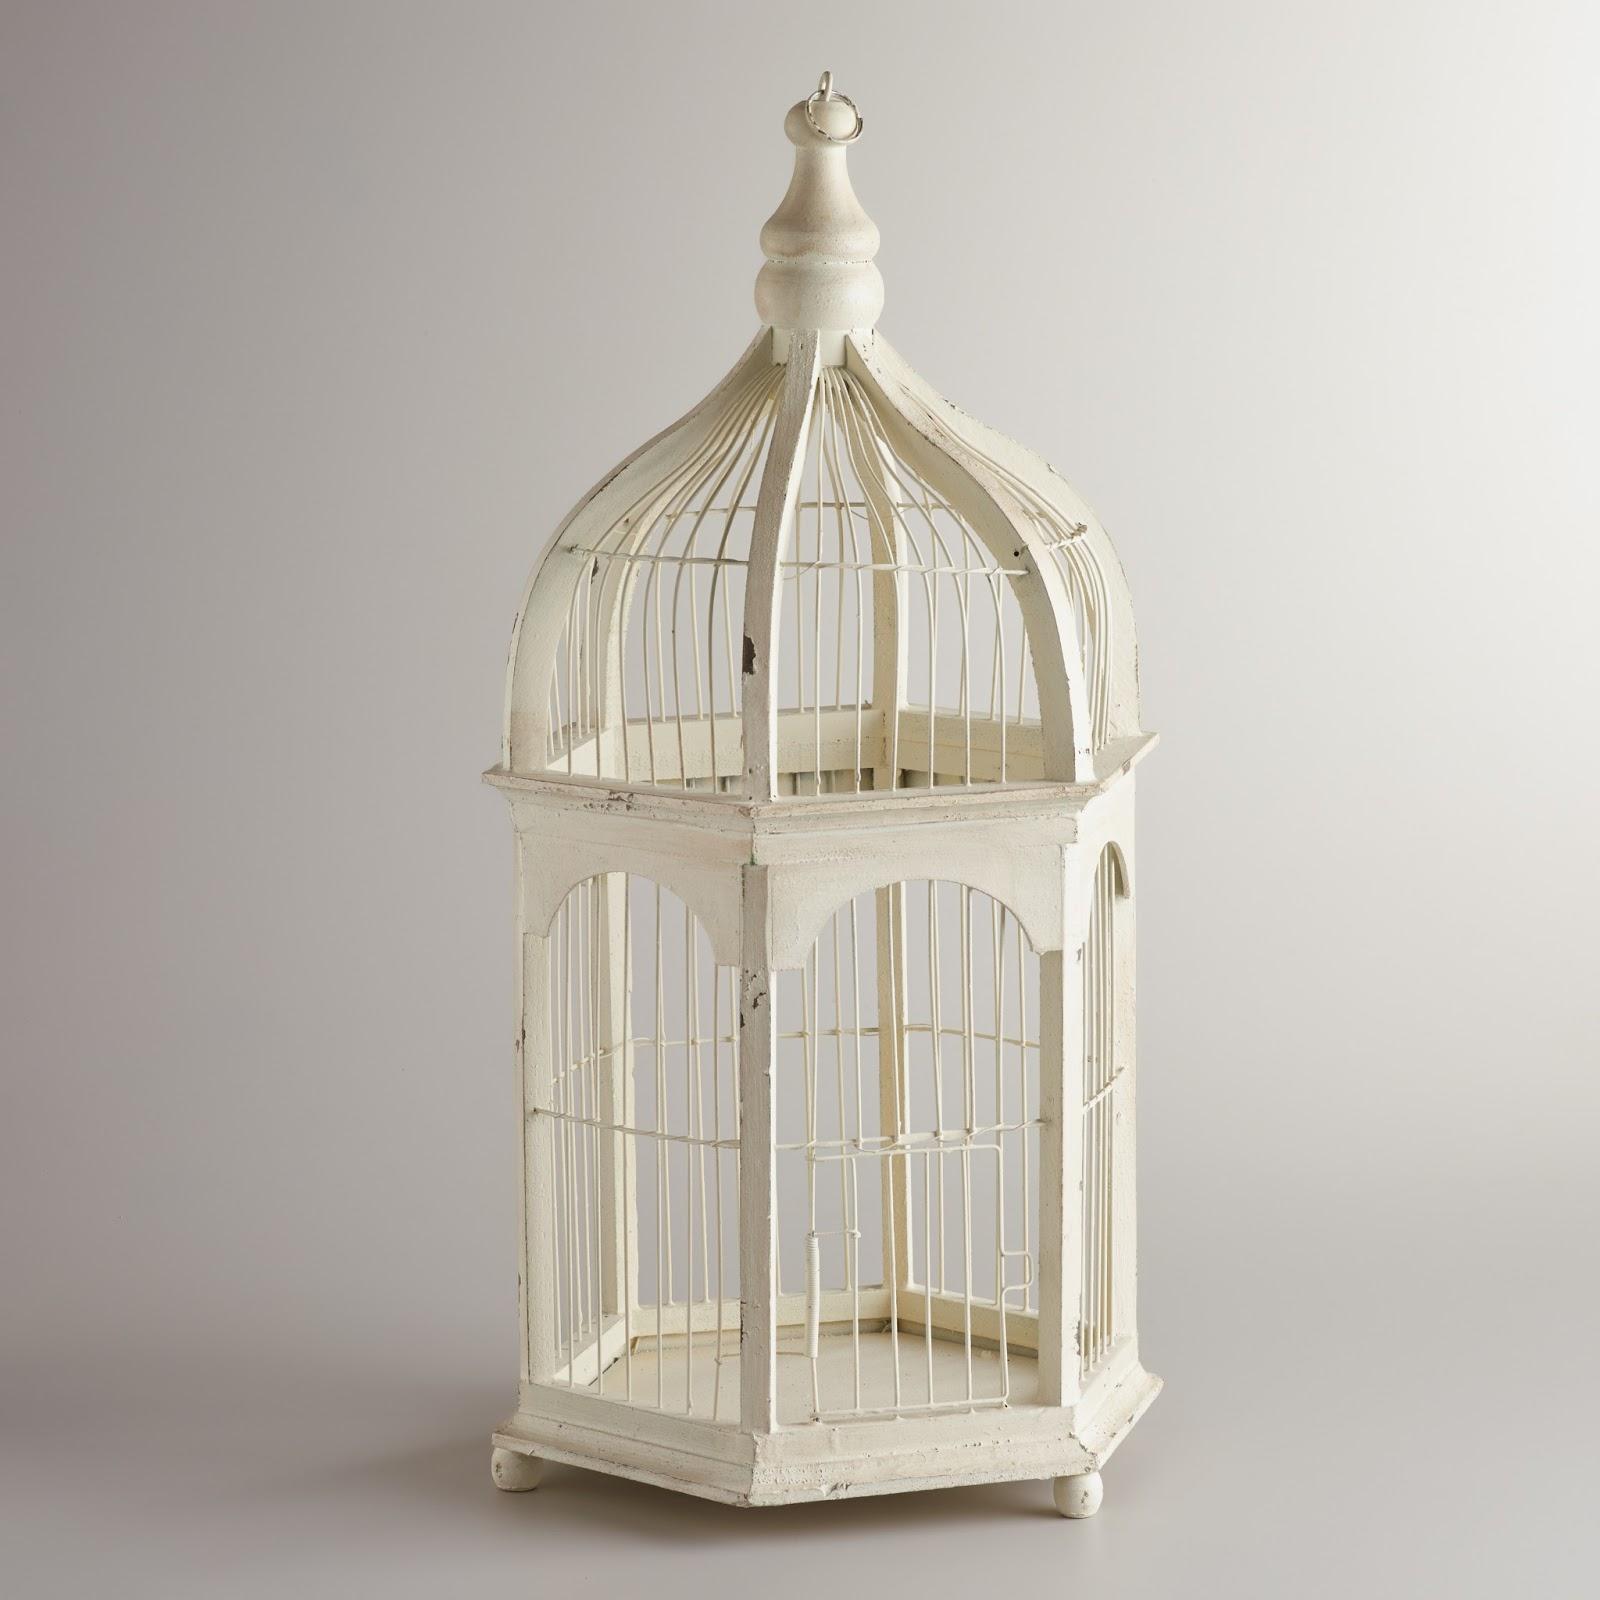 Birdcages: A Hot Decorative Trend